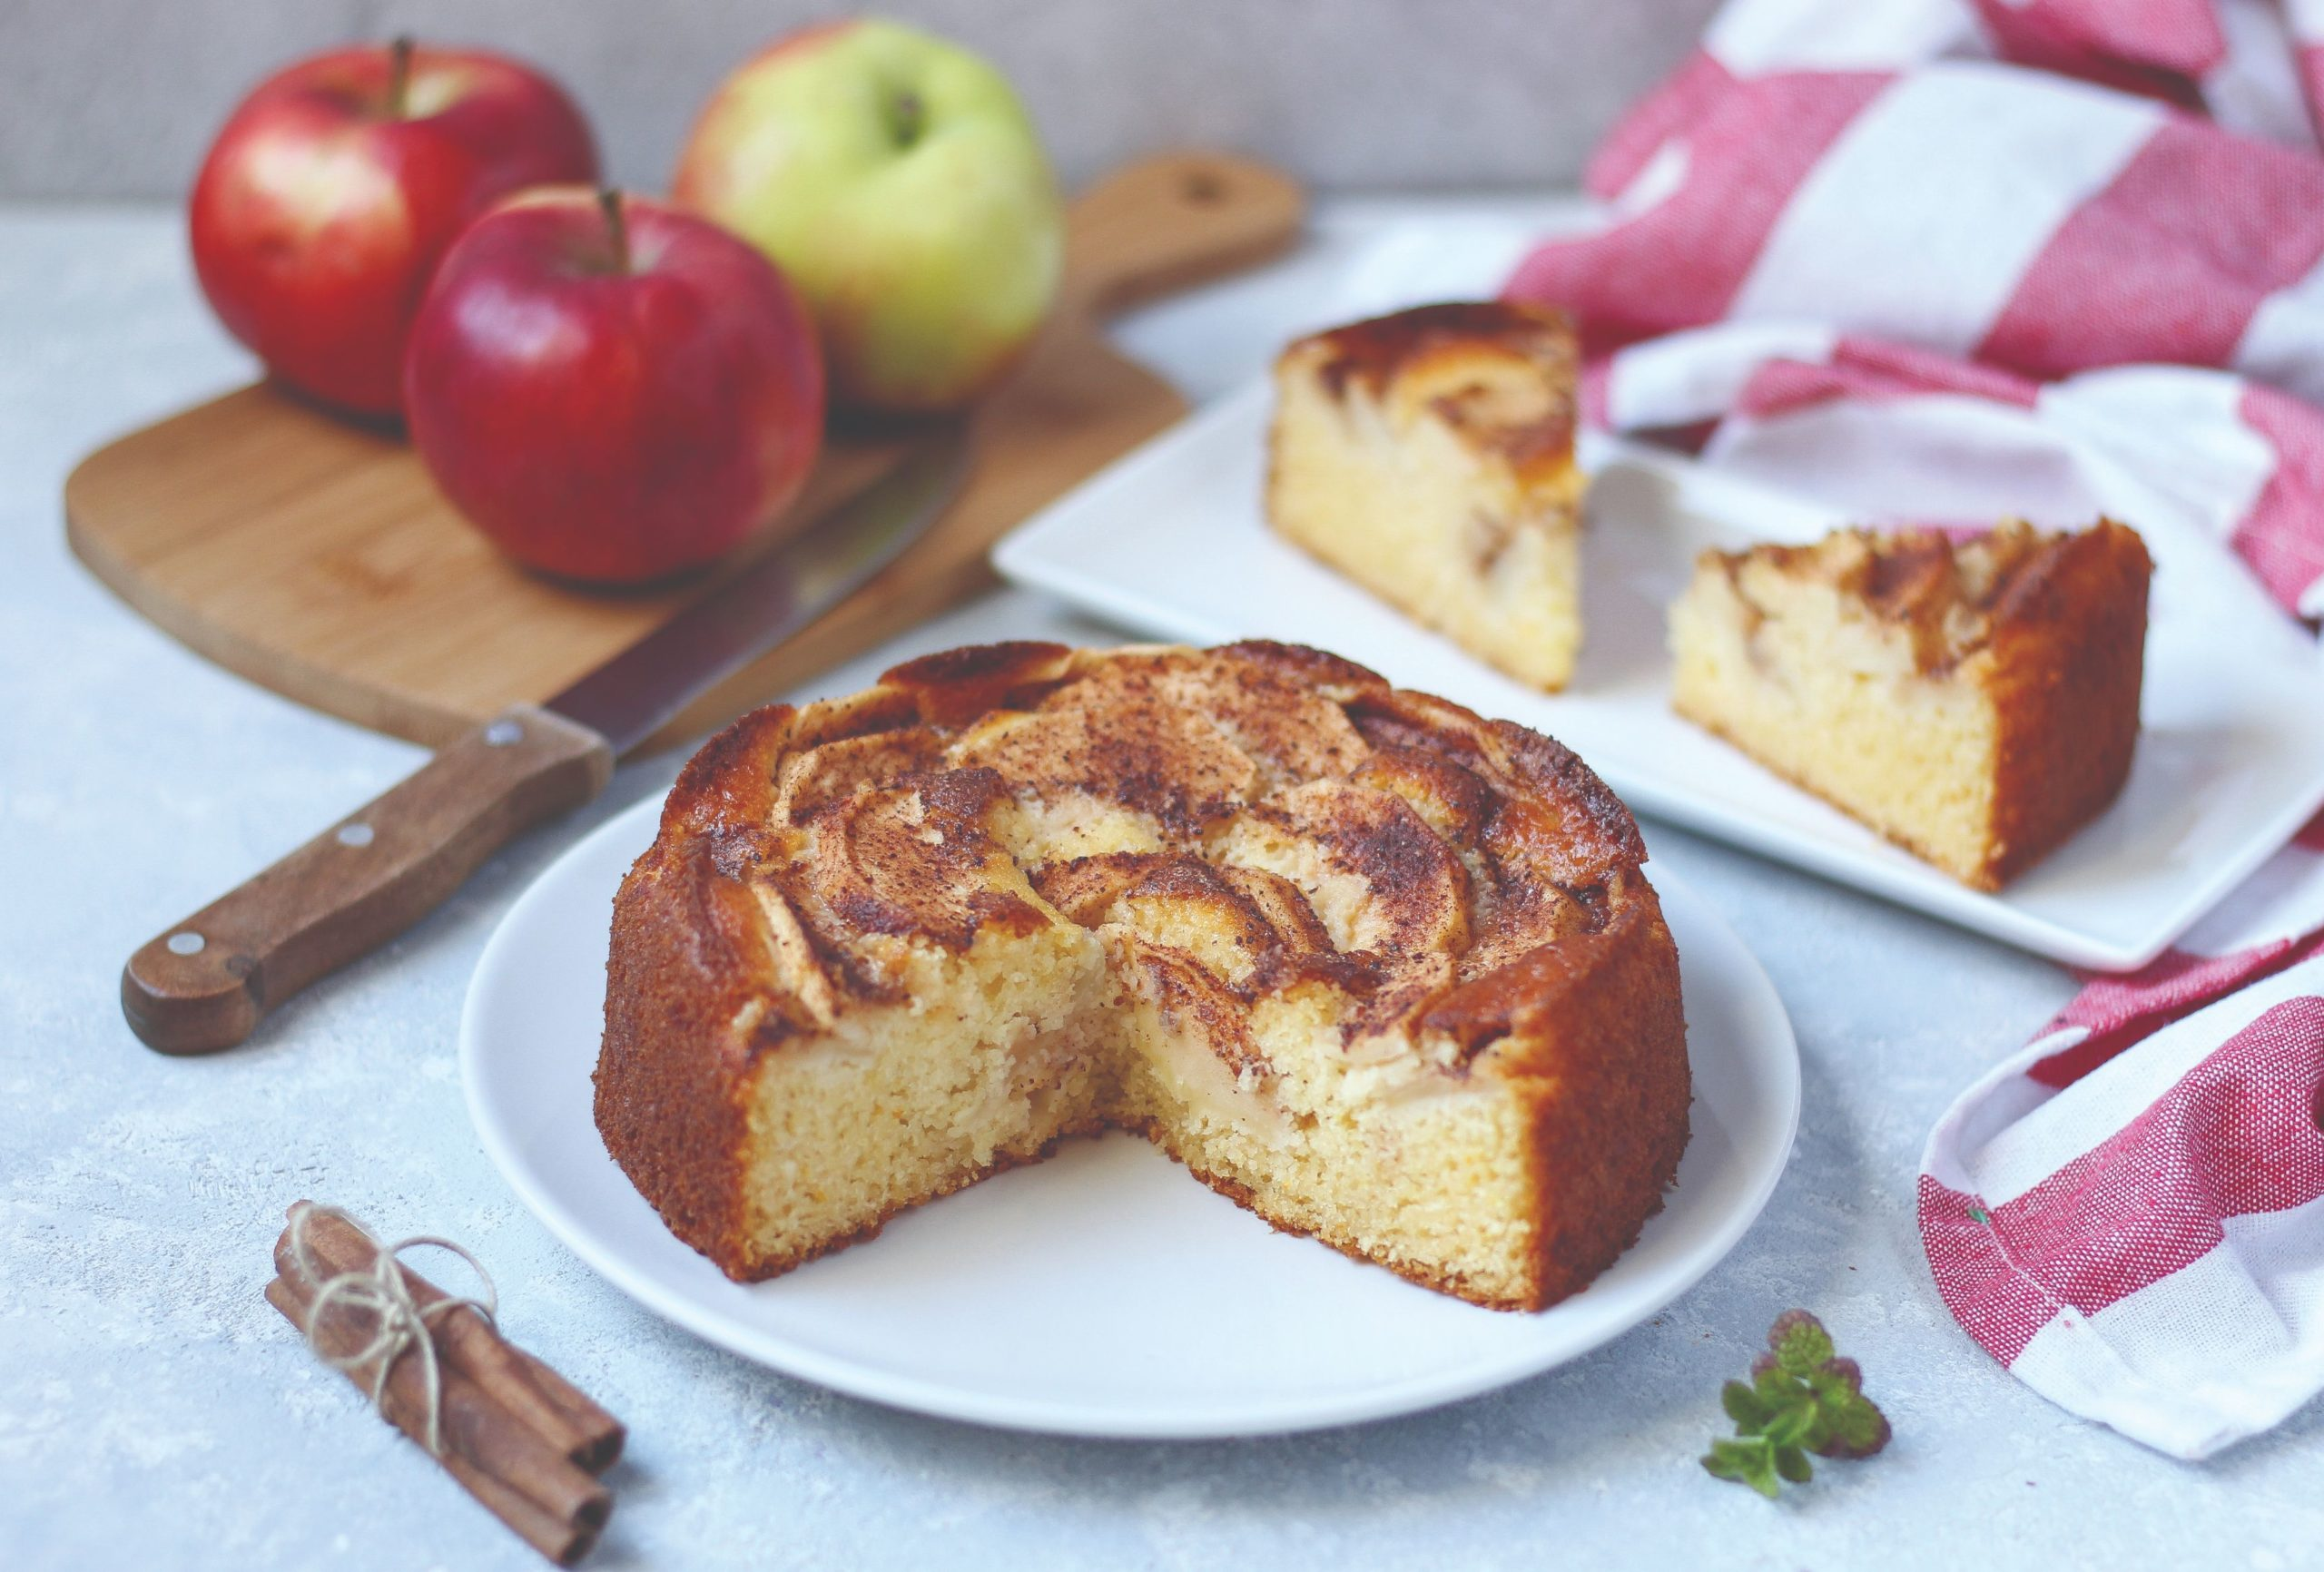 karamelizirana jabuka